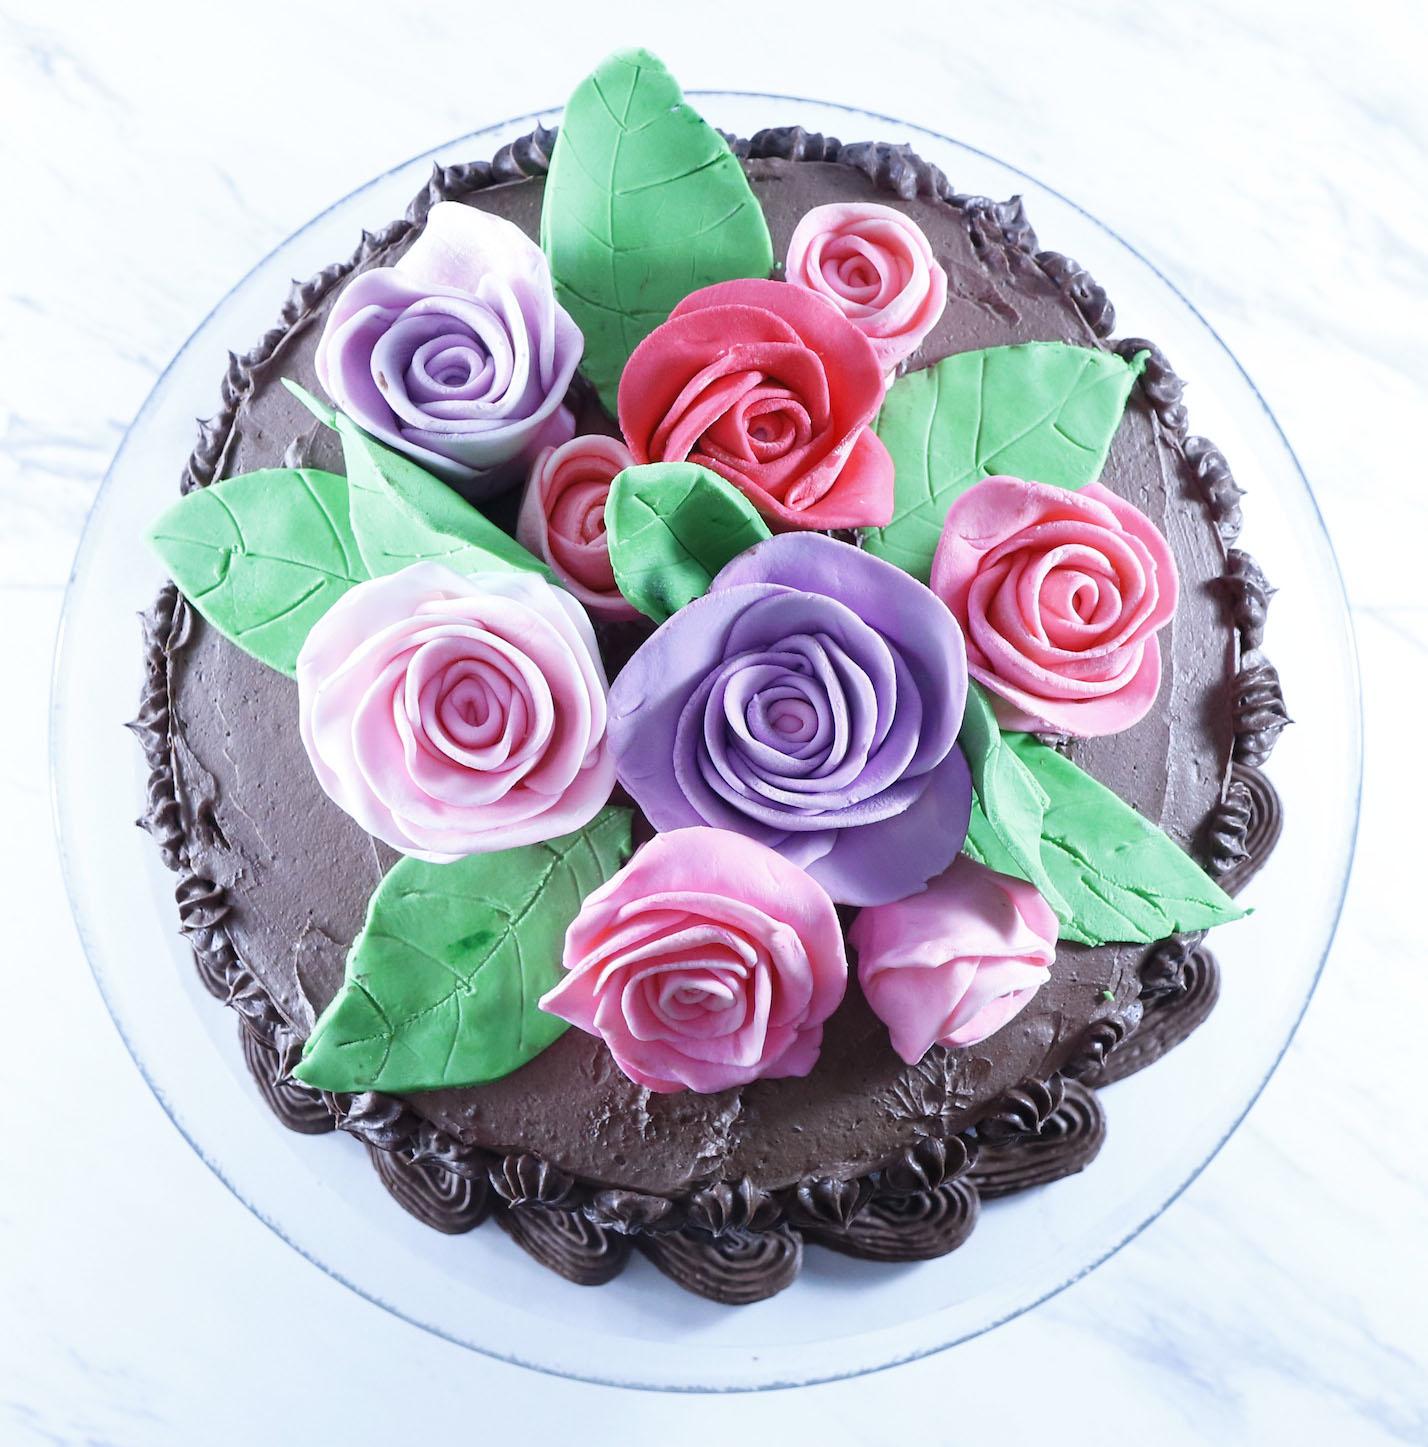 Vegan Chocolate Cake Clouds for Buttercream